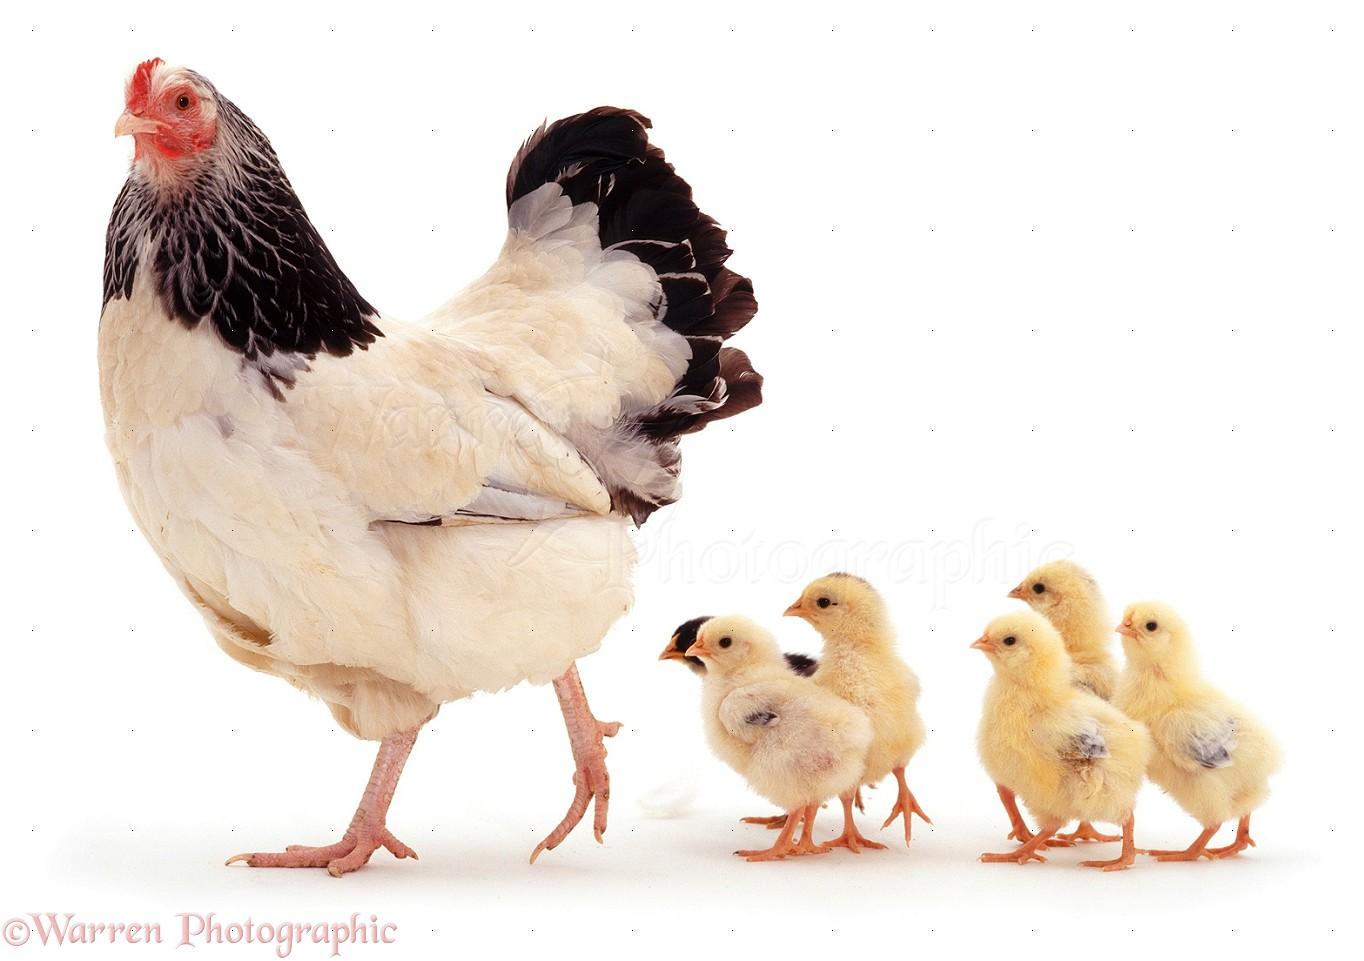 Source: https://www.warrenphotographic.co.uk/06716-light-sussex-bantam-hen-and-chicks